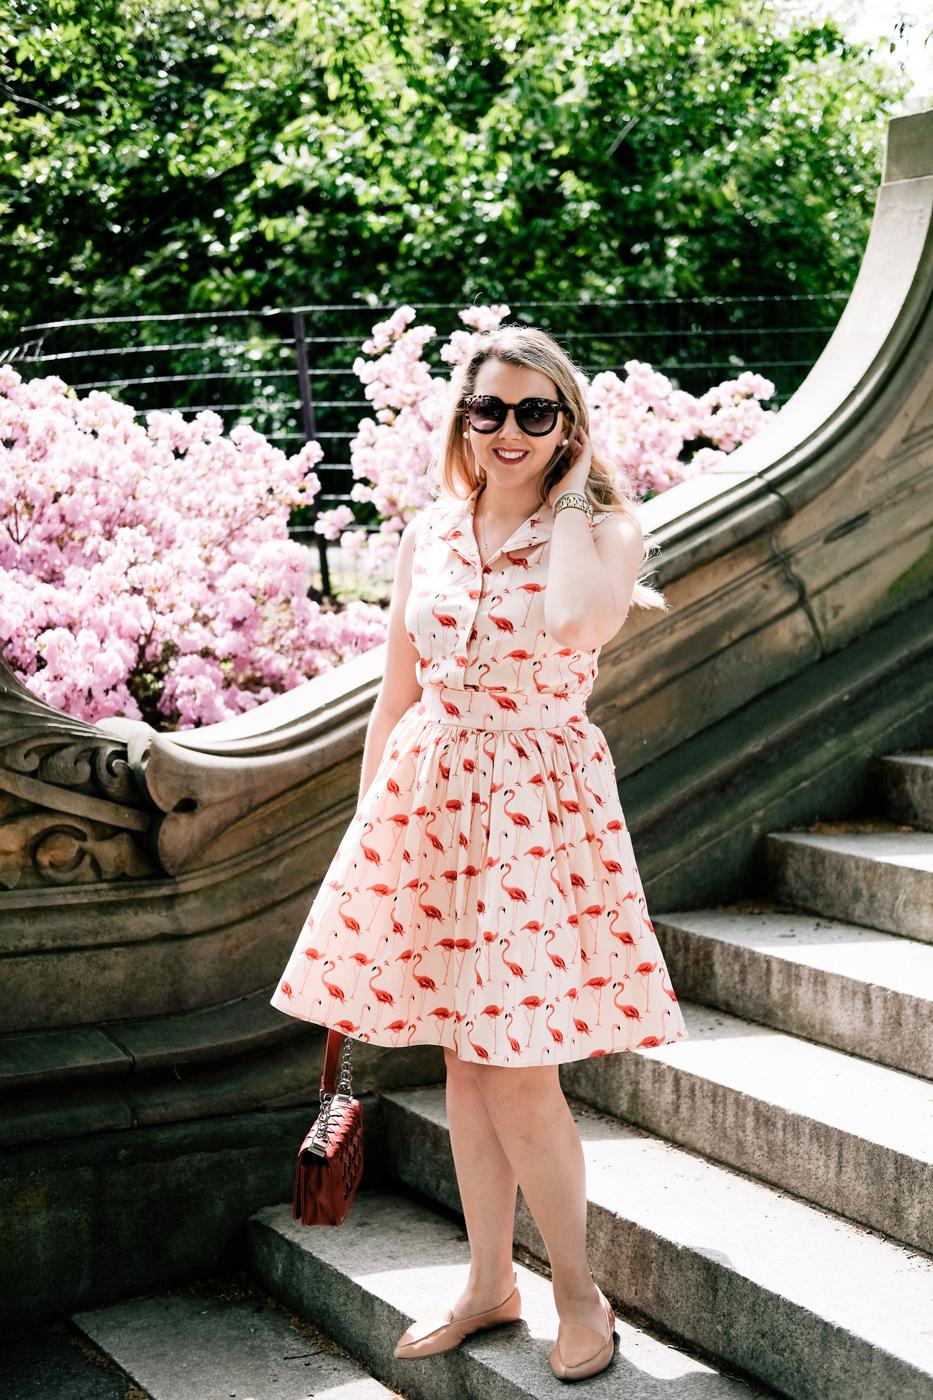 Debora Dahl, Central Park, Spring, Flamingo dress